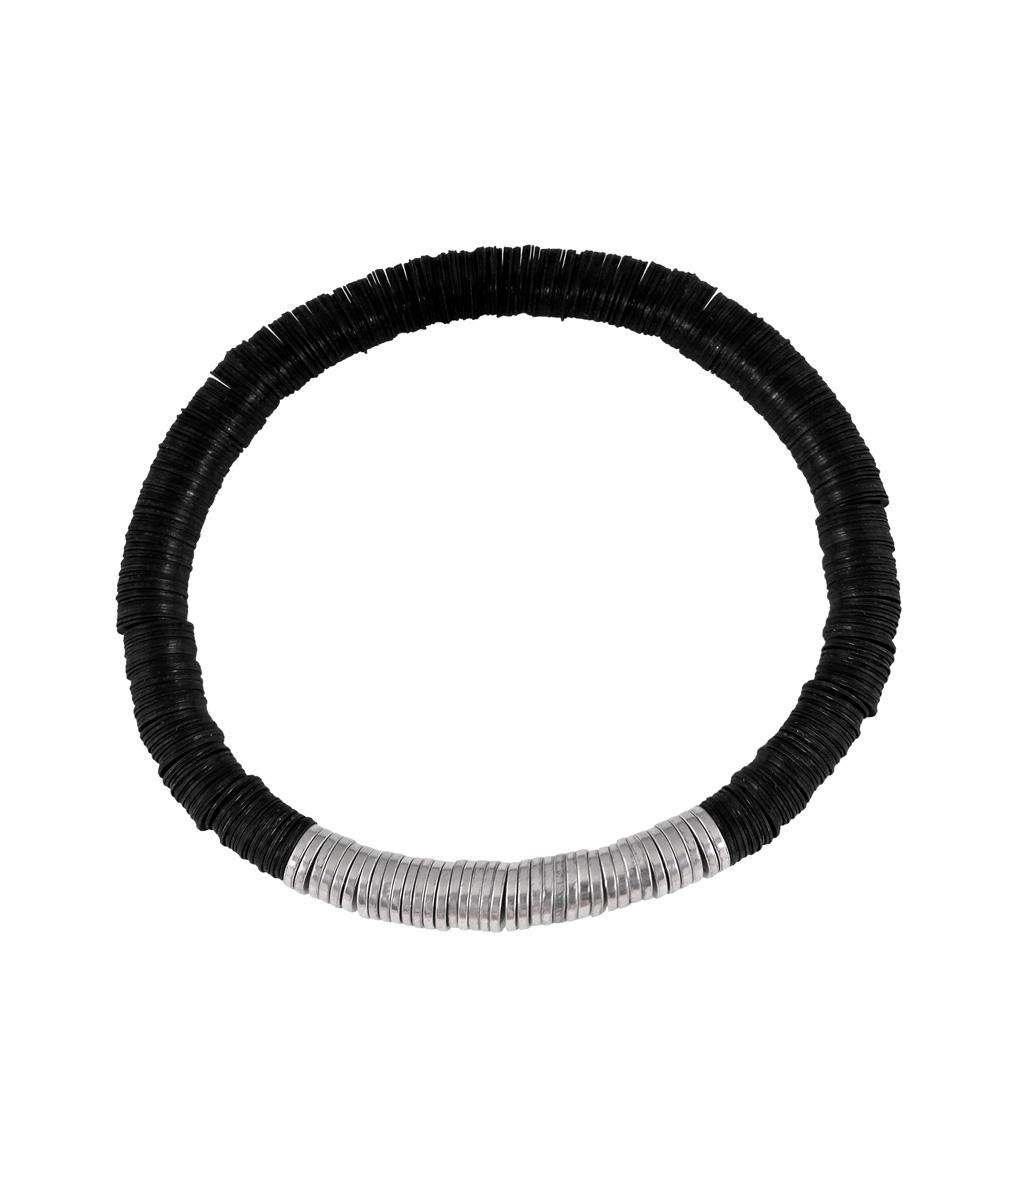 Bracelet Homme Zannot Noir Single